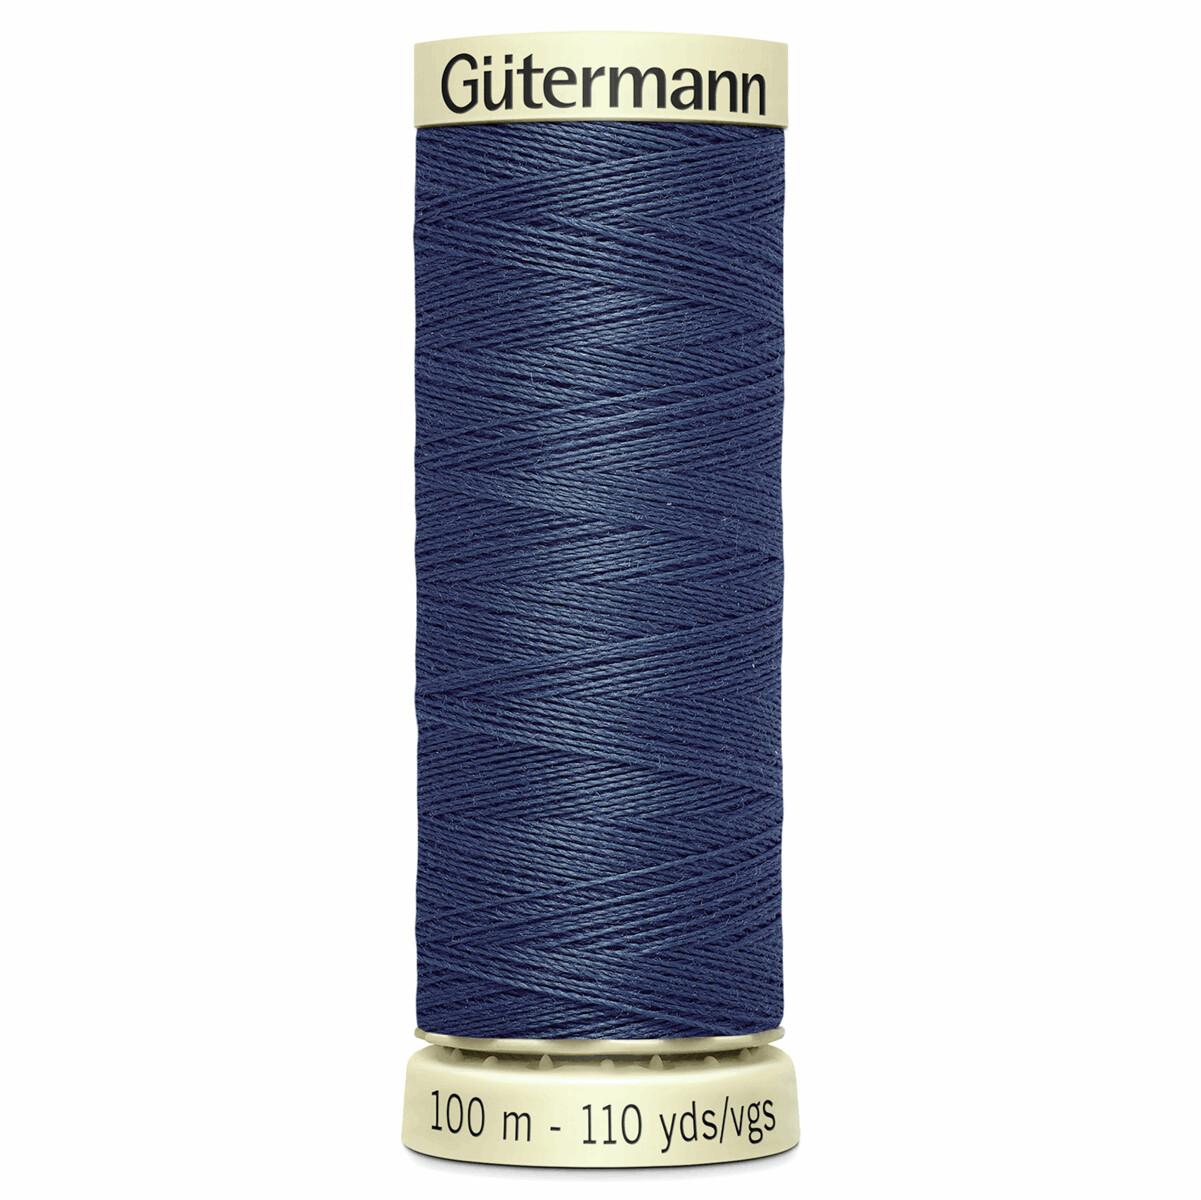 Gutermann Sew-All thread 593